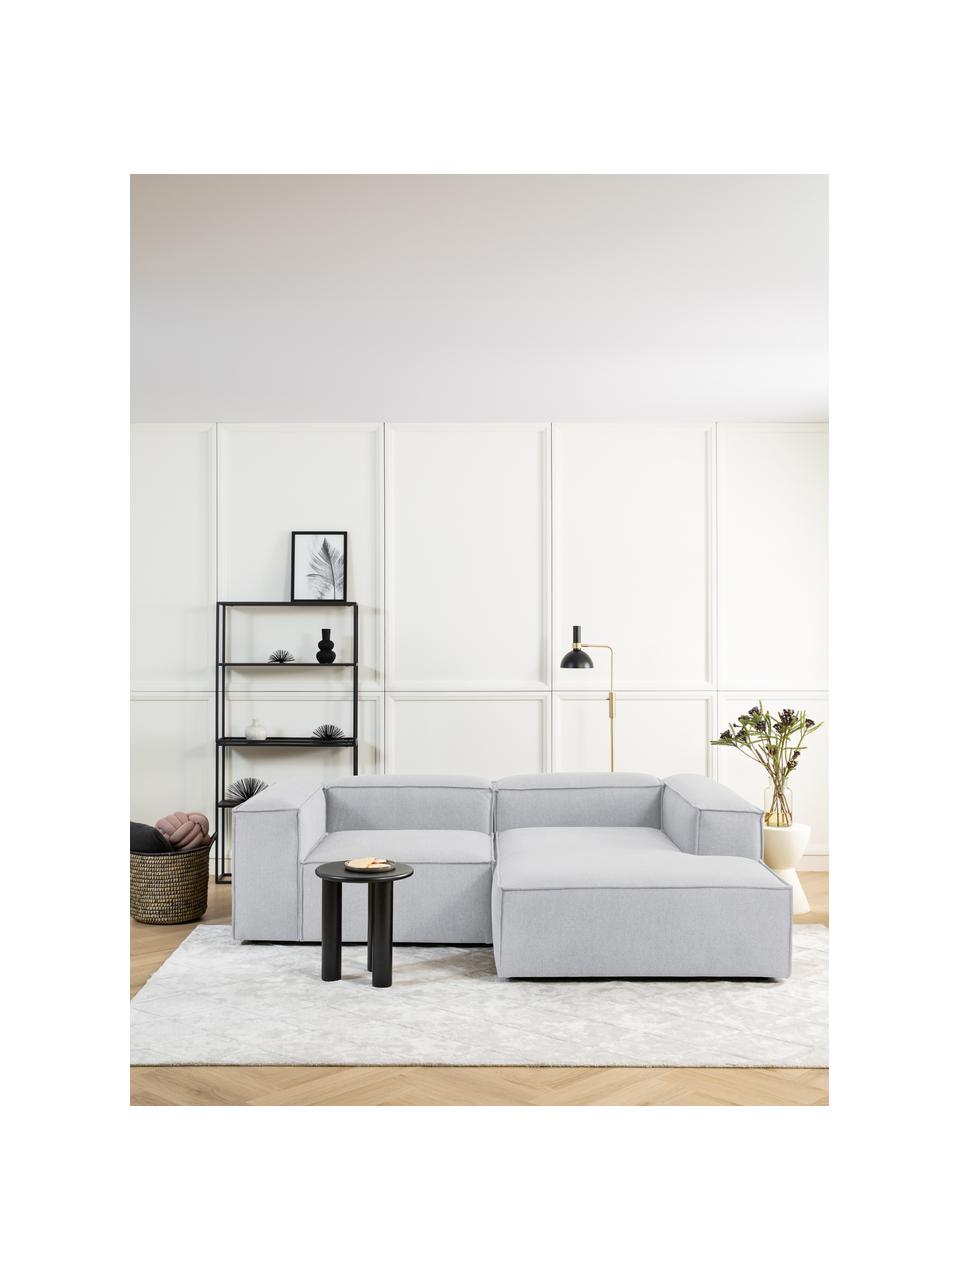 Canapé d'angle modulable gris clair Lennon, Tissu gris clair